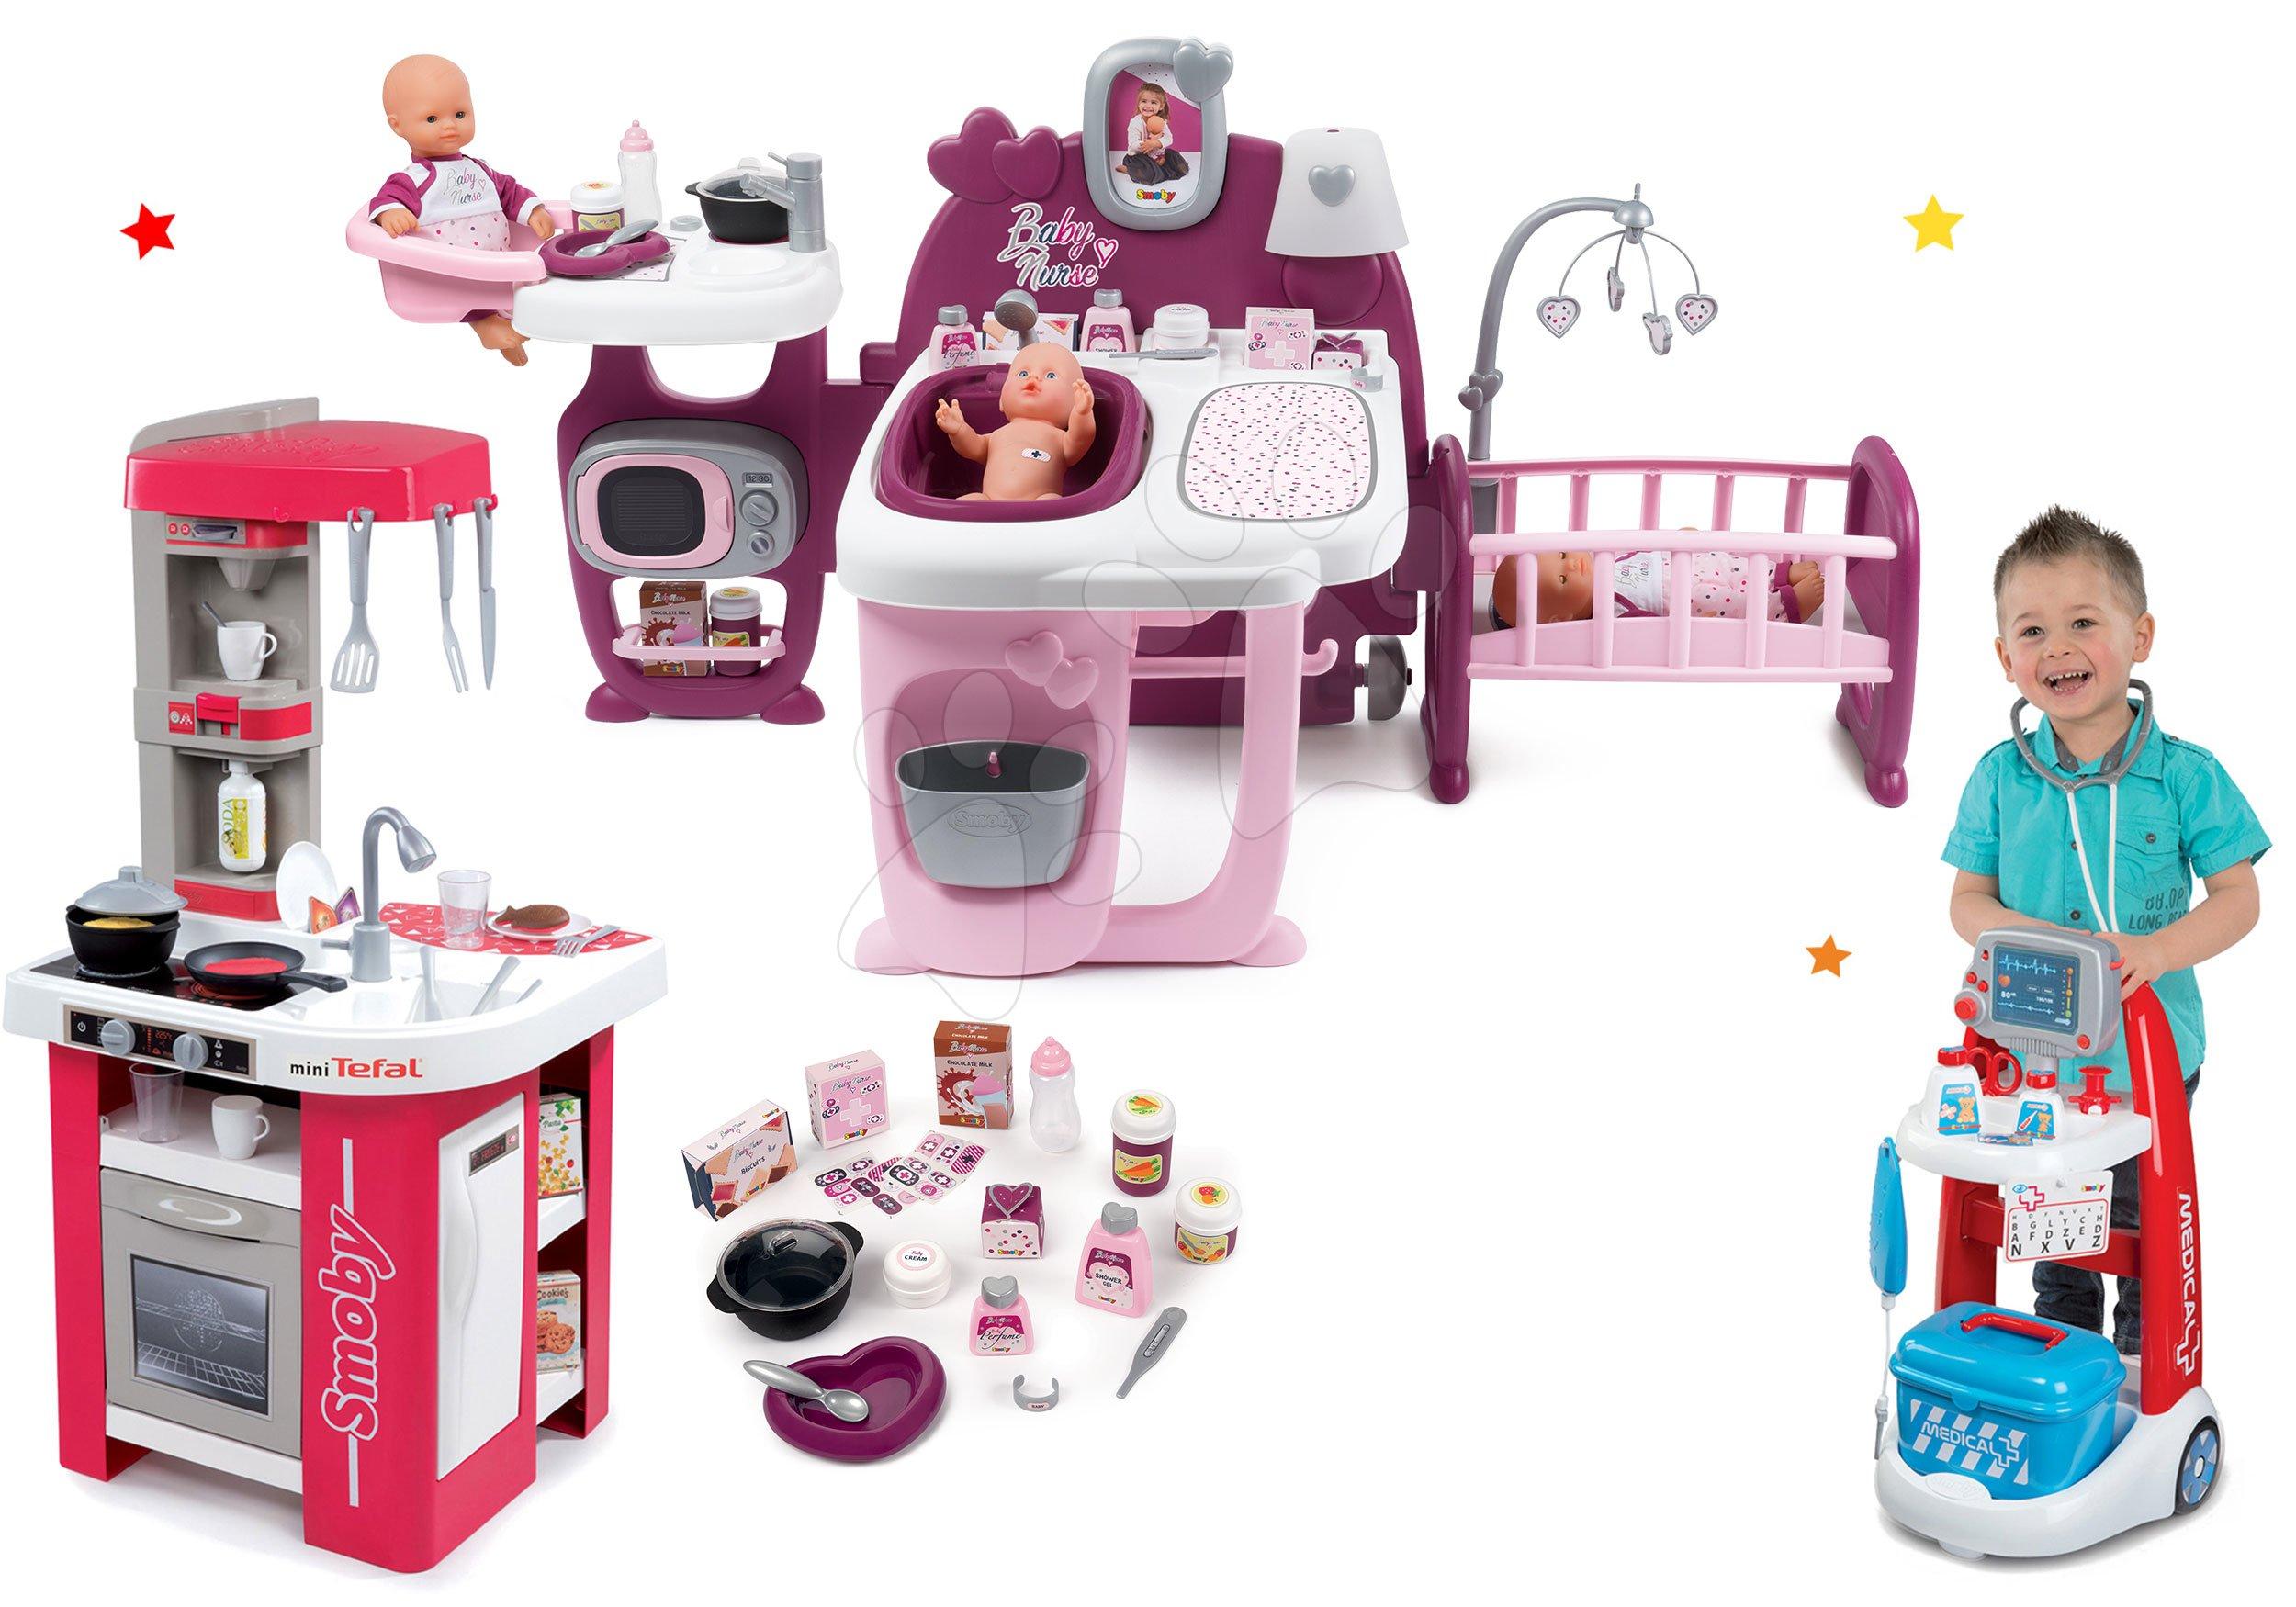 Smoby set domček pre bábiku Baby Nurse Doll´s Play Center, kuchynka Tefal elektronická a lekársky vozík 220327-8